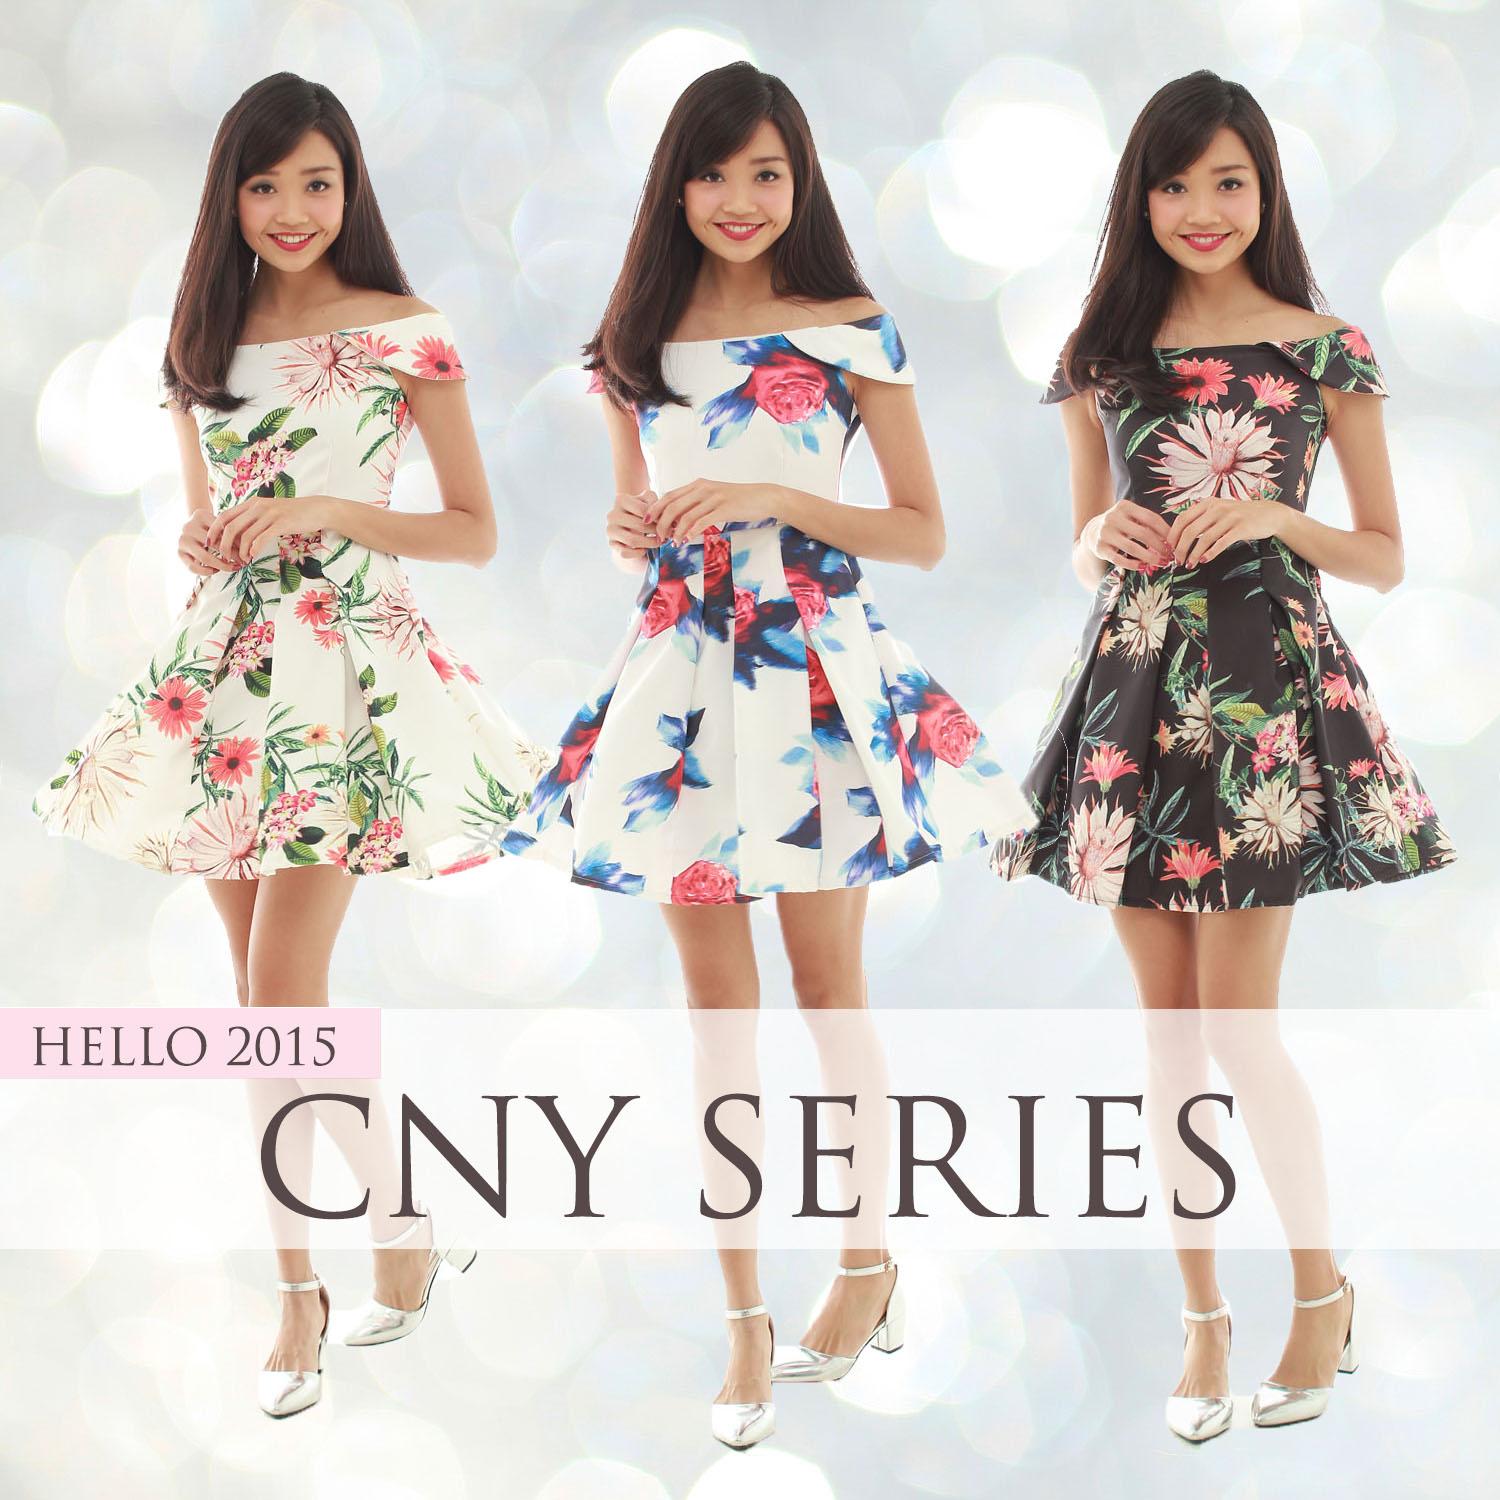 cny series